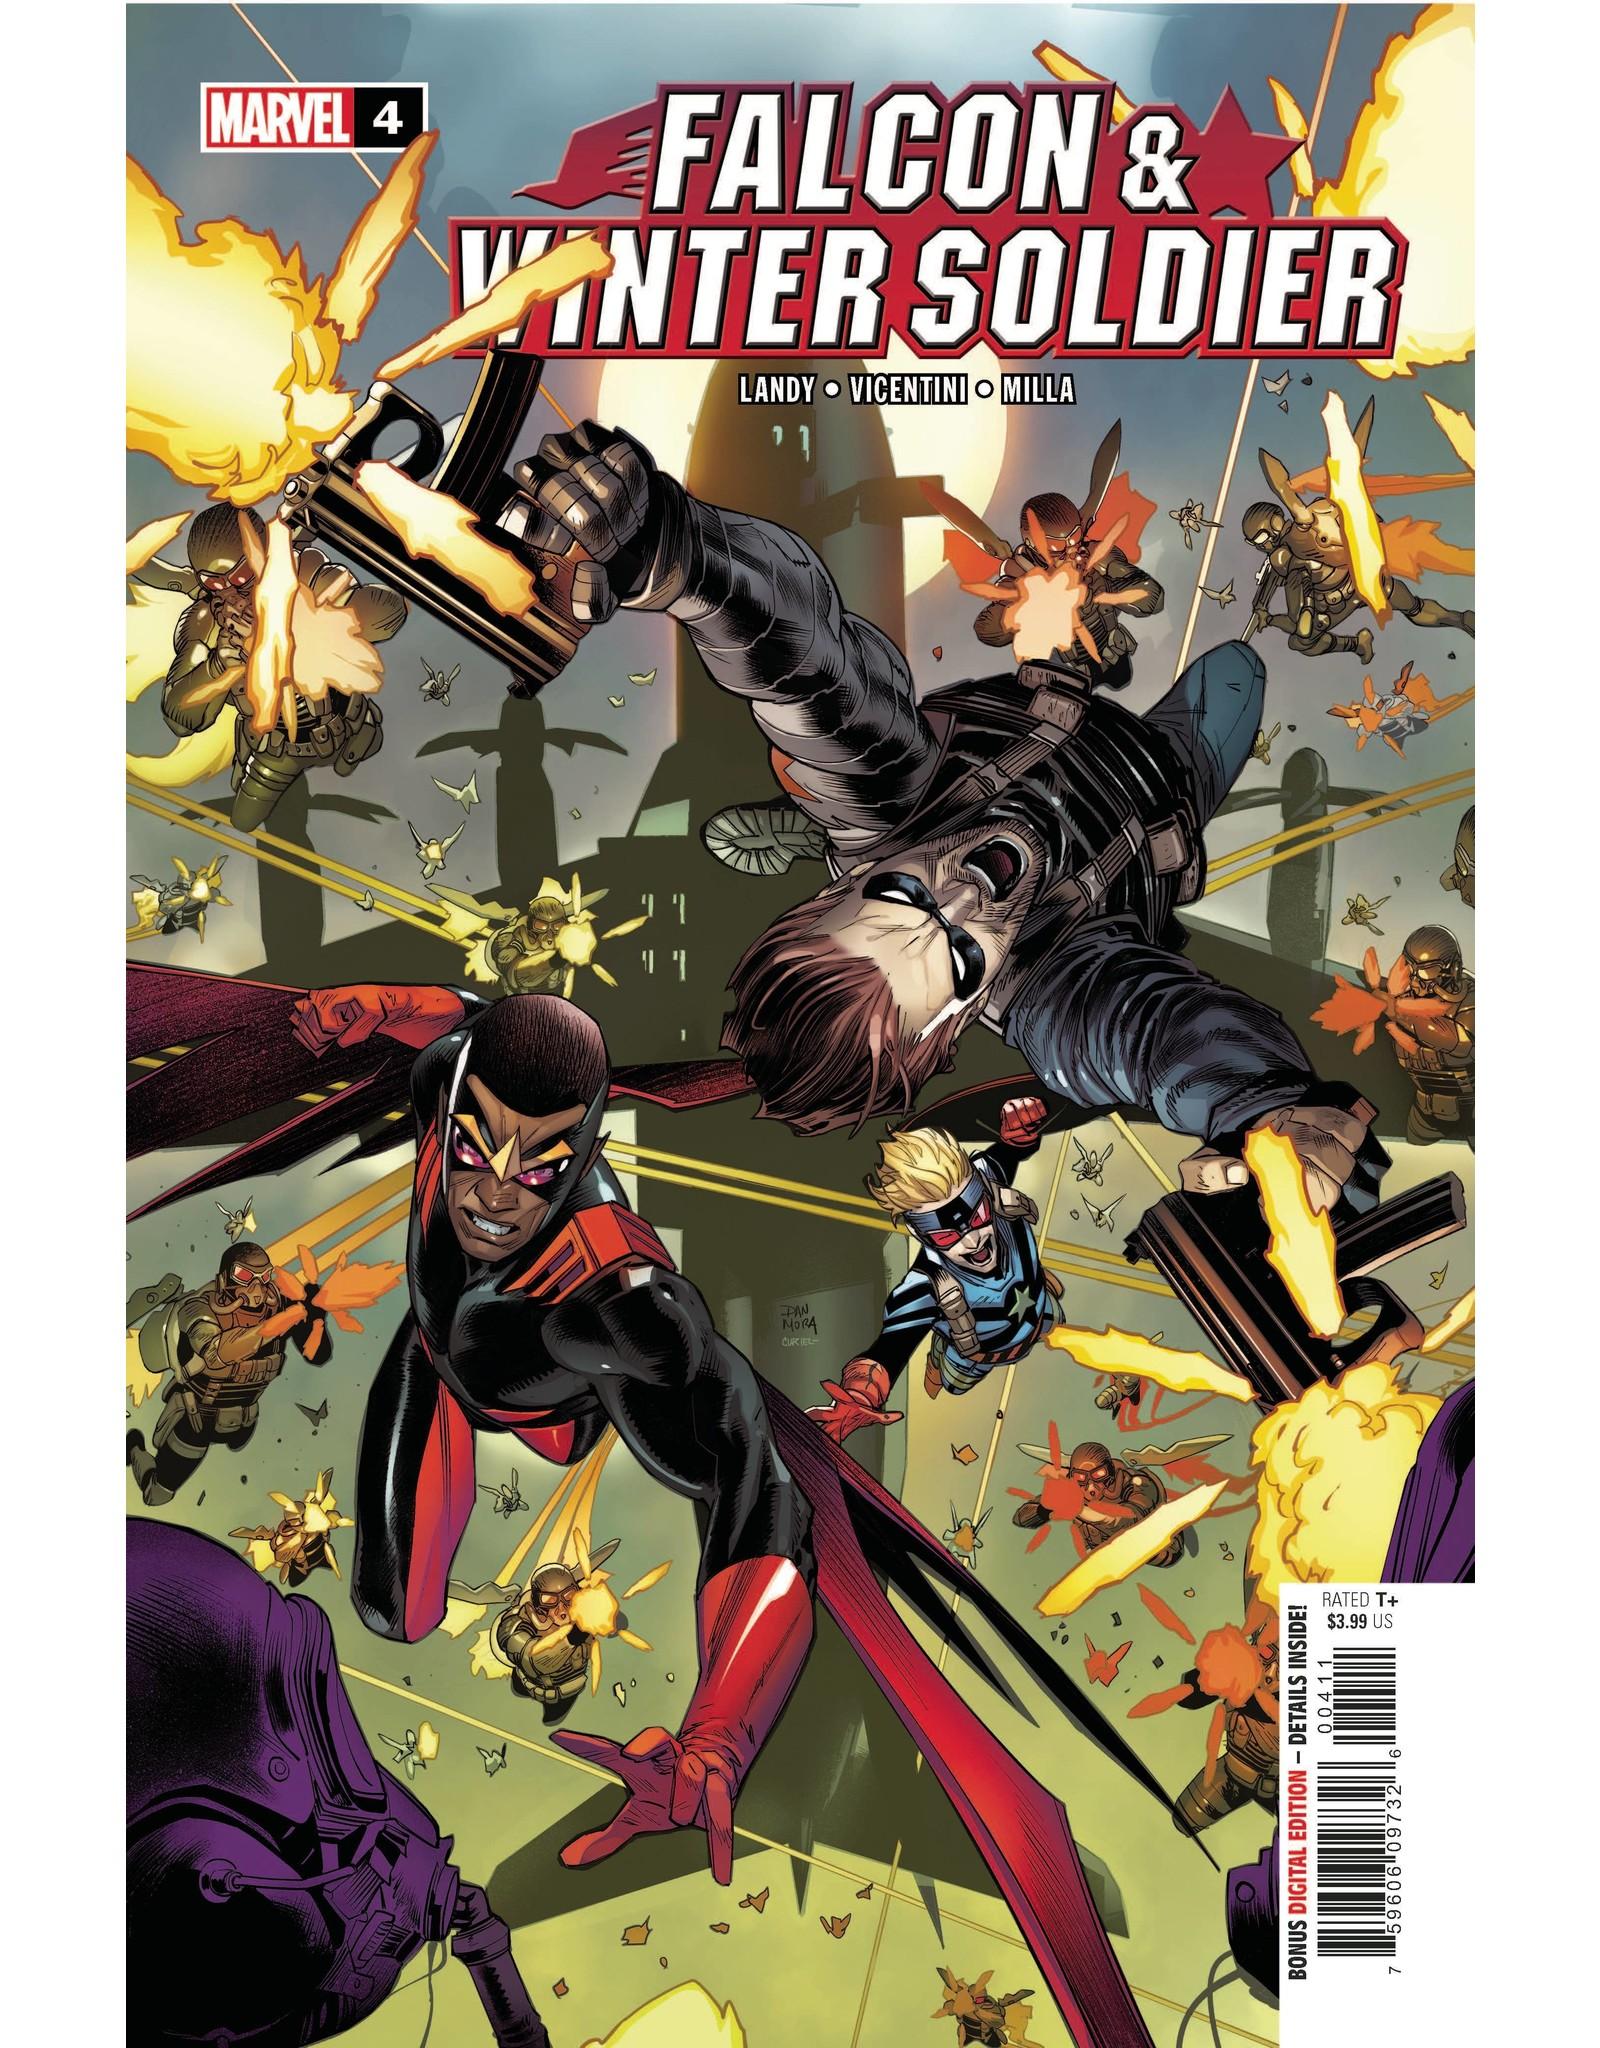 MARVEL COMICS FALCON & WINTER SOLDIER #4 (OF 5)